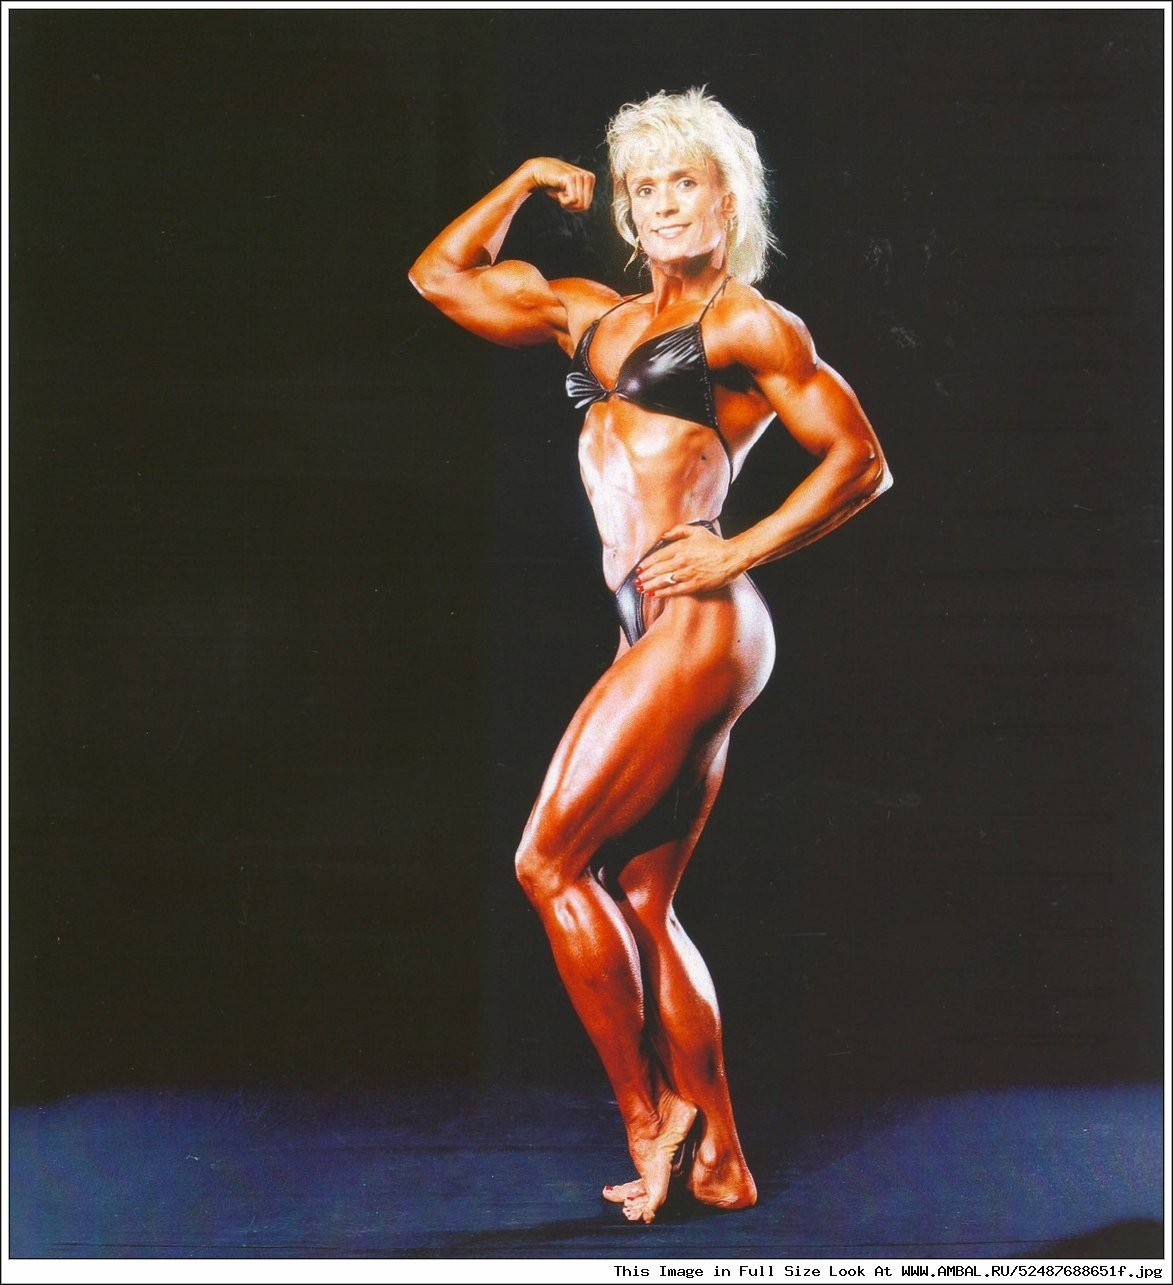 Tonya knight nude pics sexual gallery